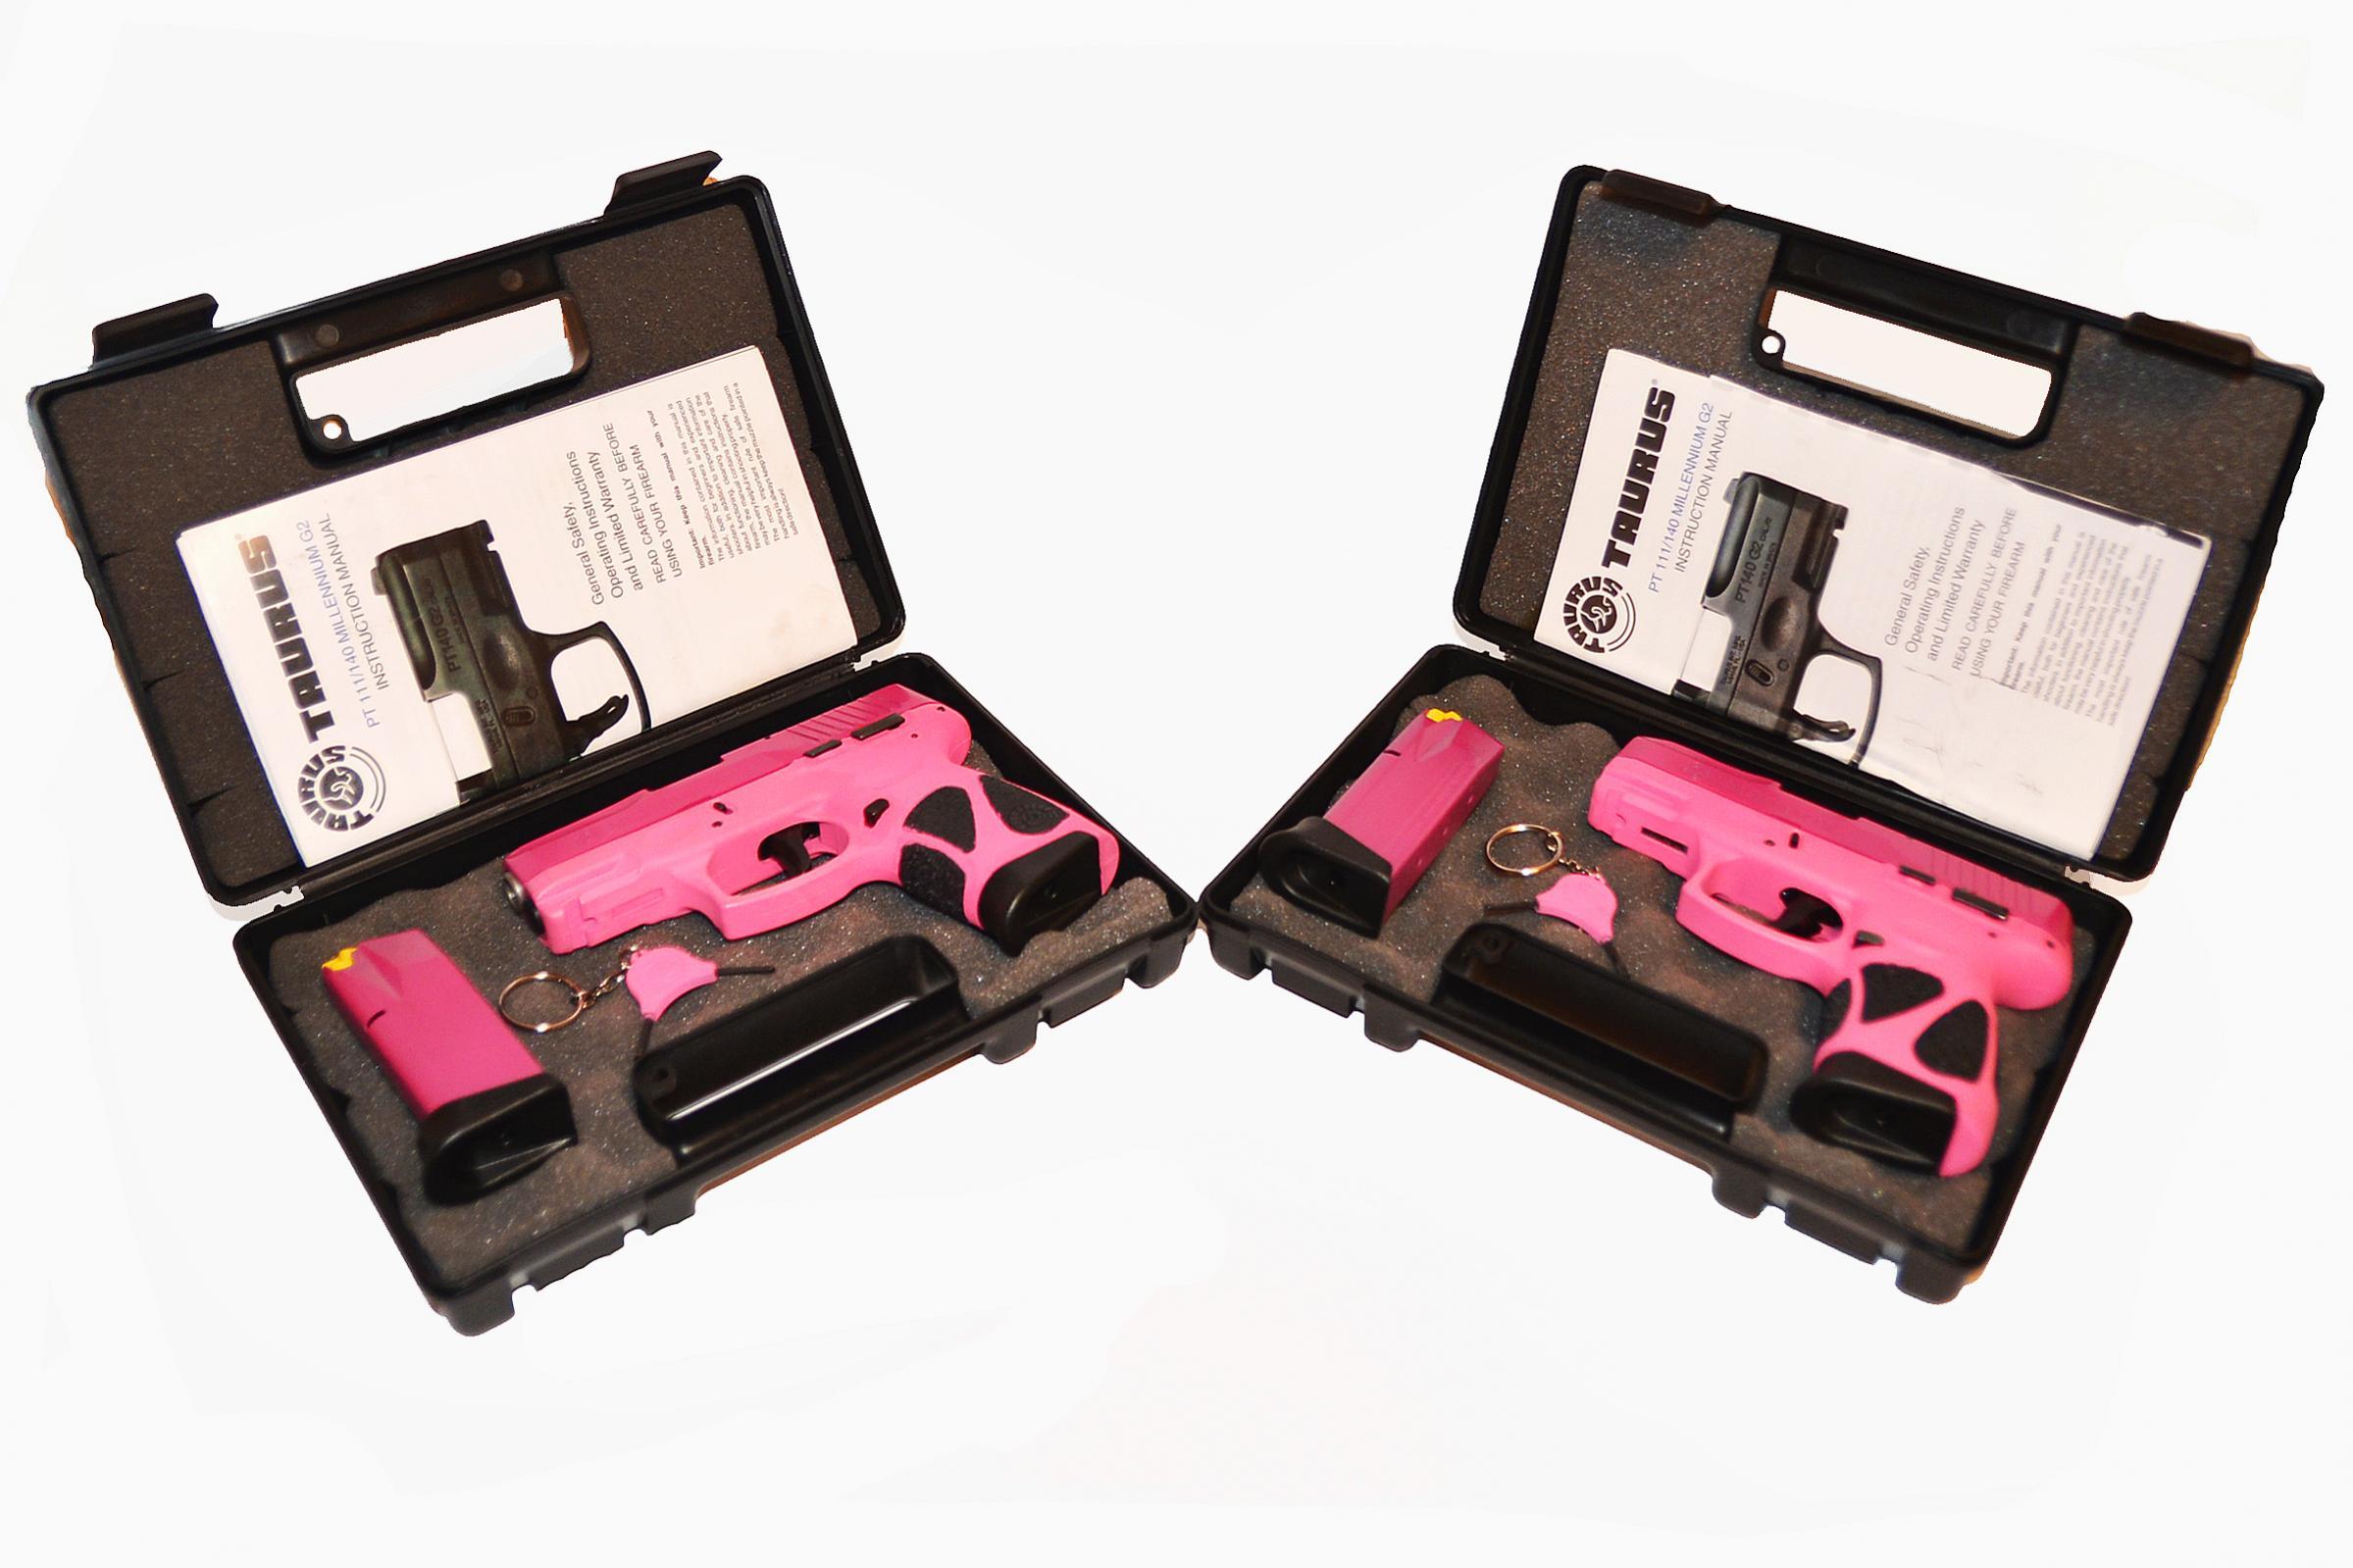 Heres Some Photos Of The Custom Cerakoted Taurus Pt111 Millennium 9mm Schematics G2 Pistols